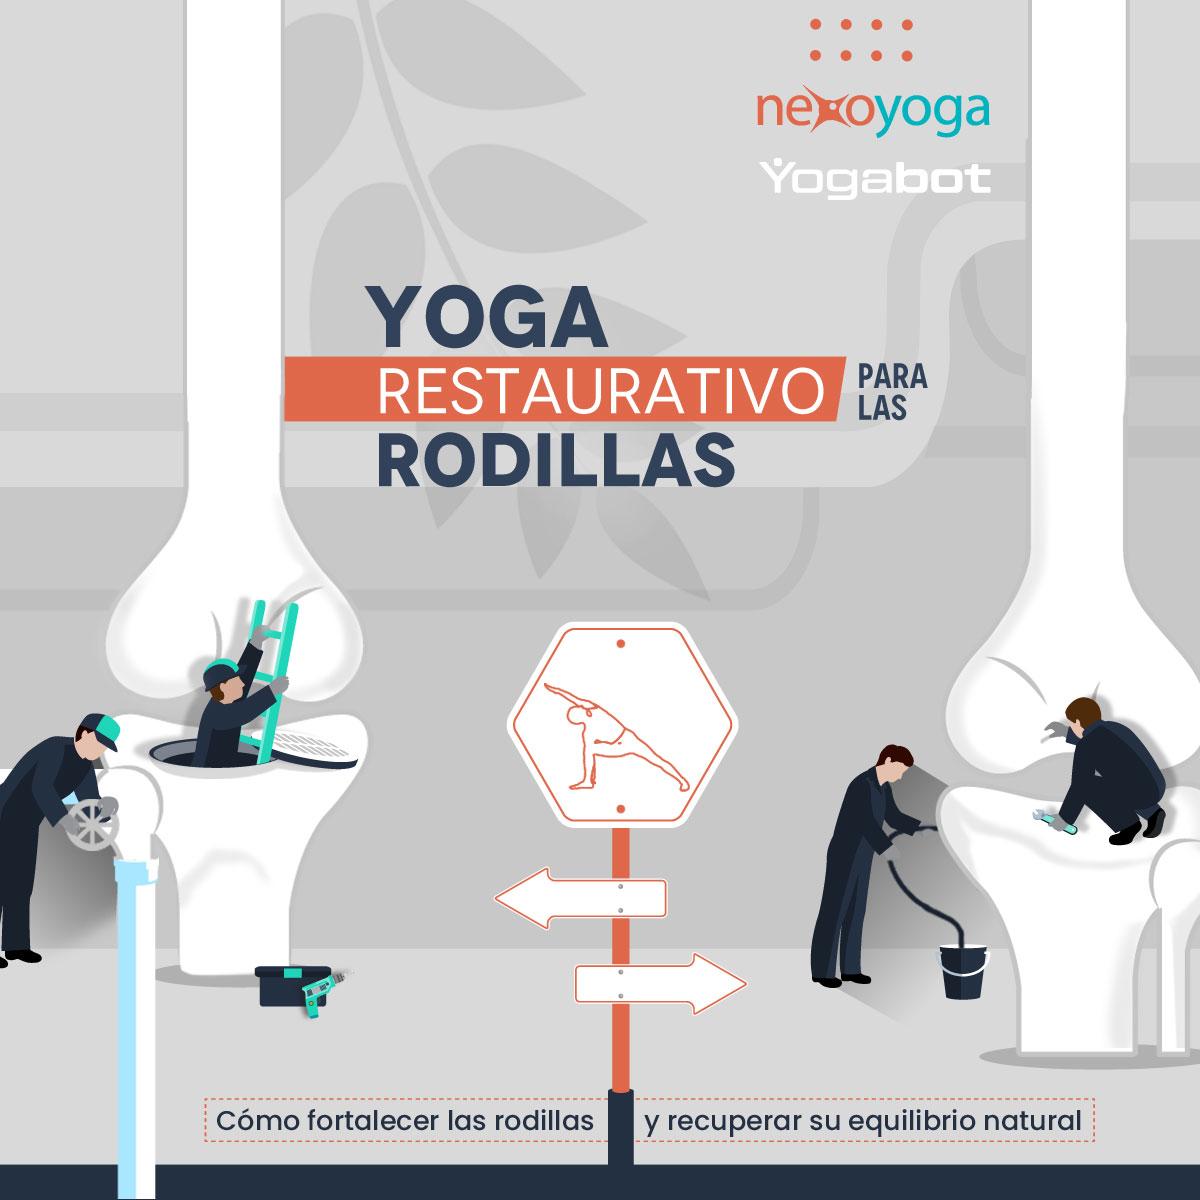 Yoga Restaurativo para Rodillas